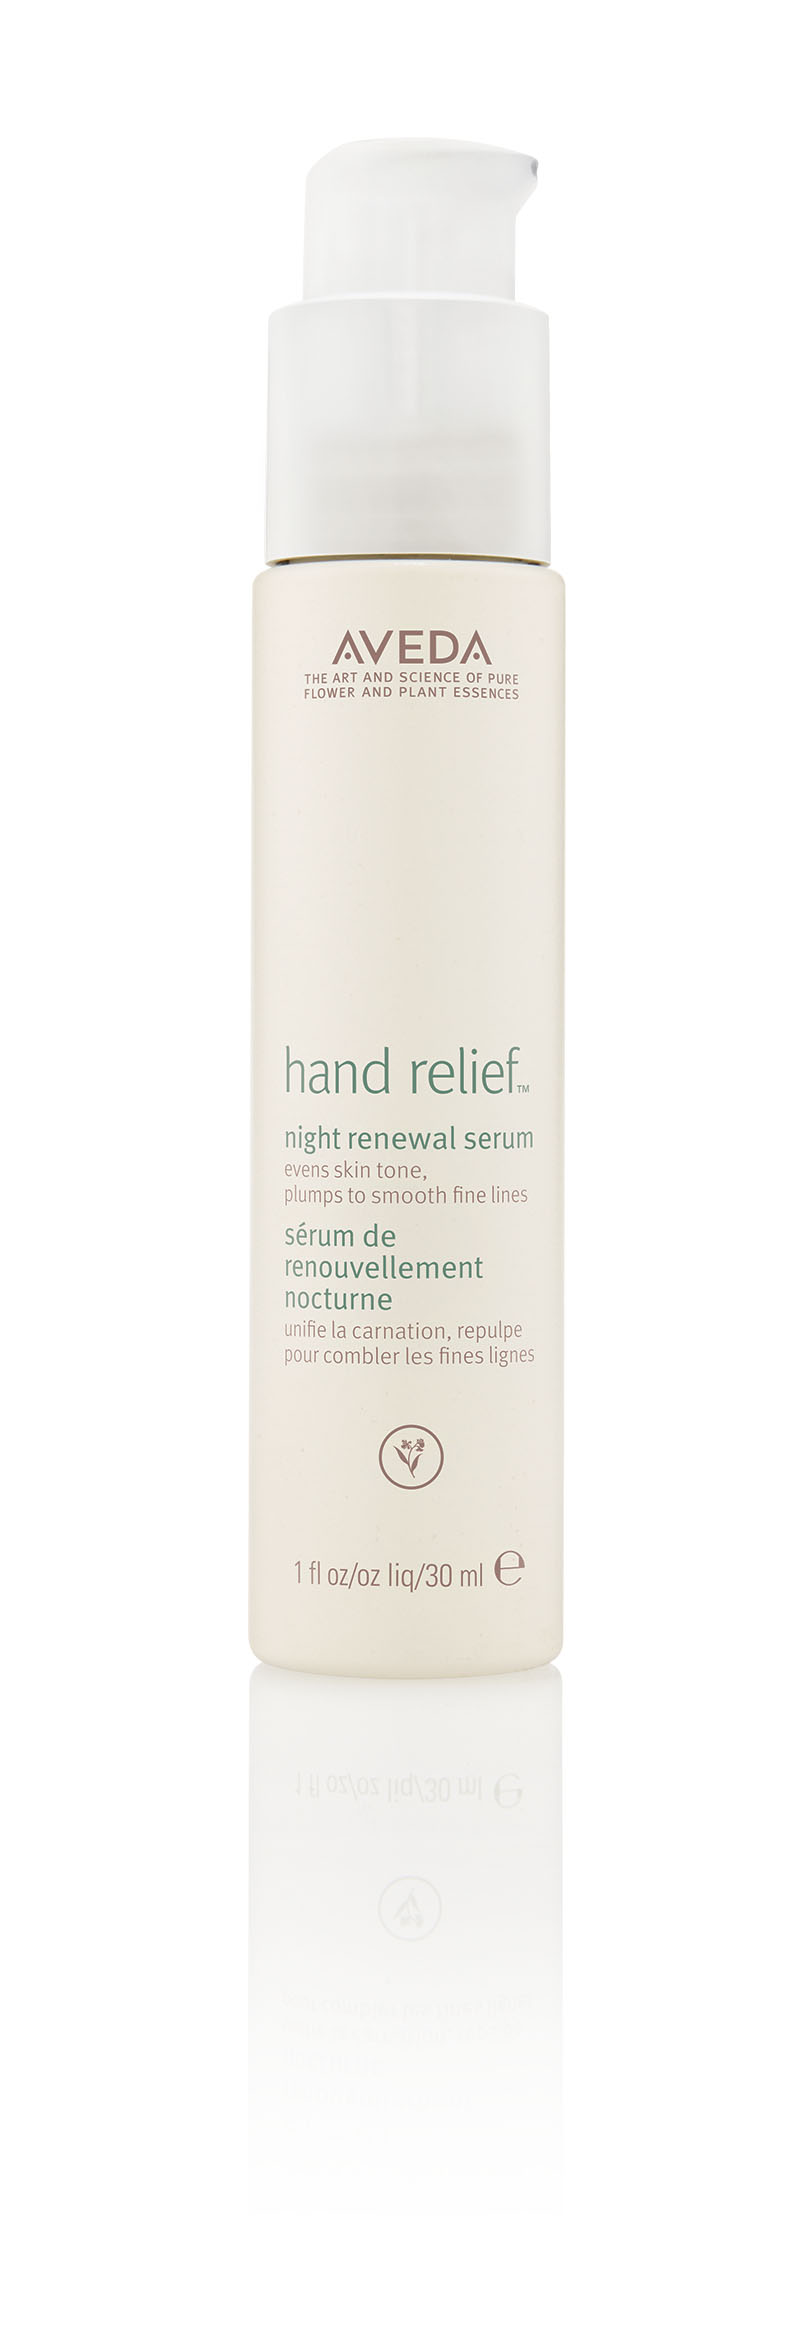 An image of Aveda Hand Relief Night Renewal Serum 30ml